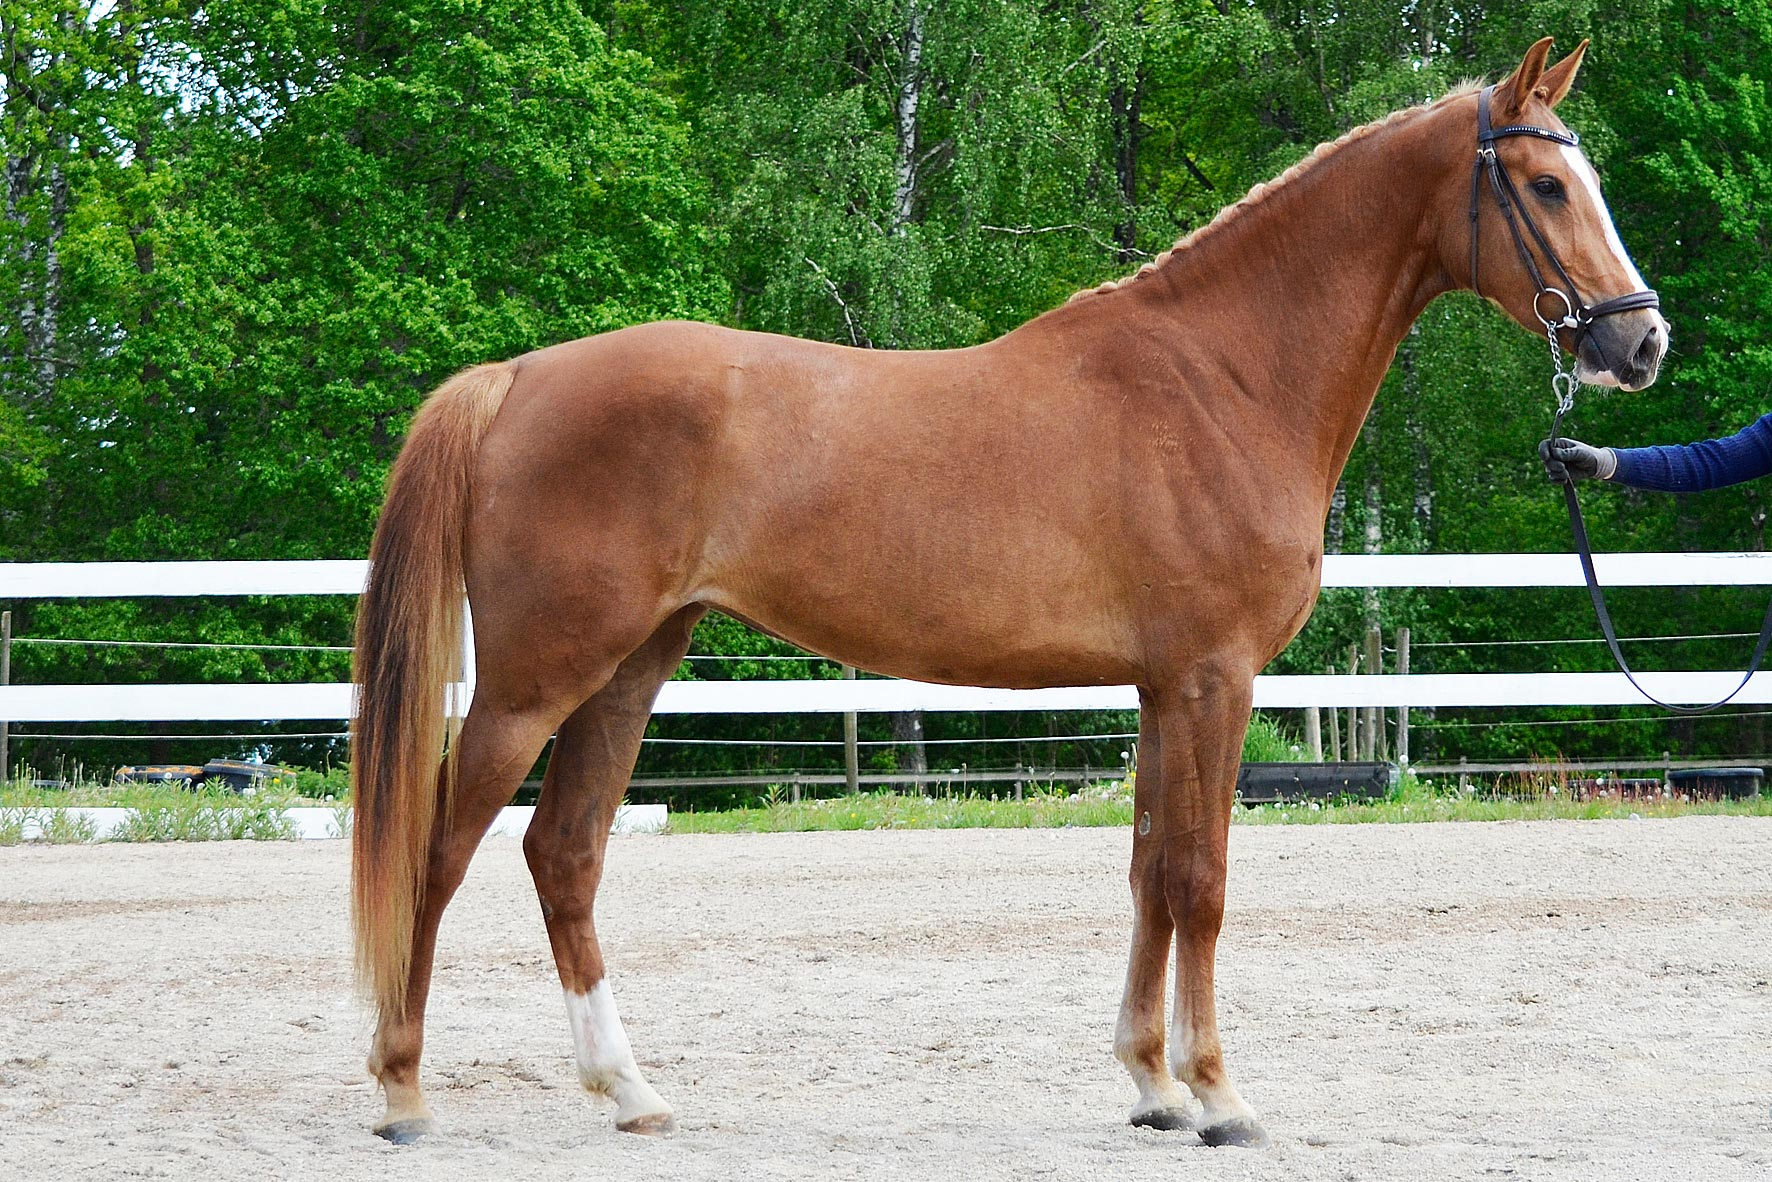 Yazi Hästak SWB sto 170 cm e Heartbeat u Indra Hästak e Cortus, uppf/äg Hästak AB. 8,5 7,5 7 8 8 8 = 78,3%, diplom